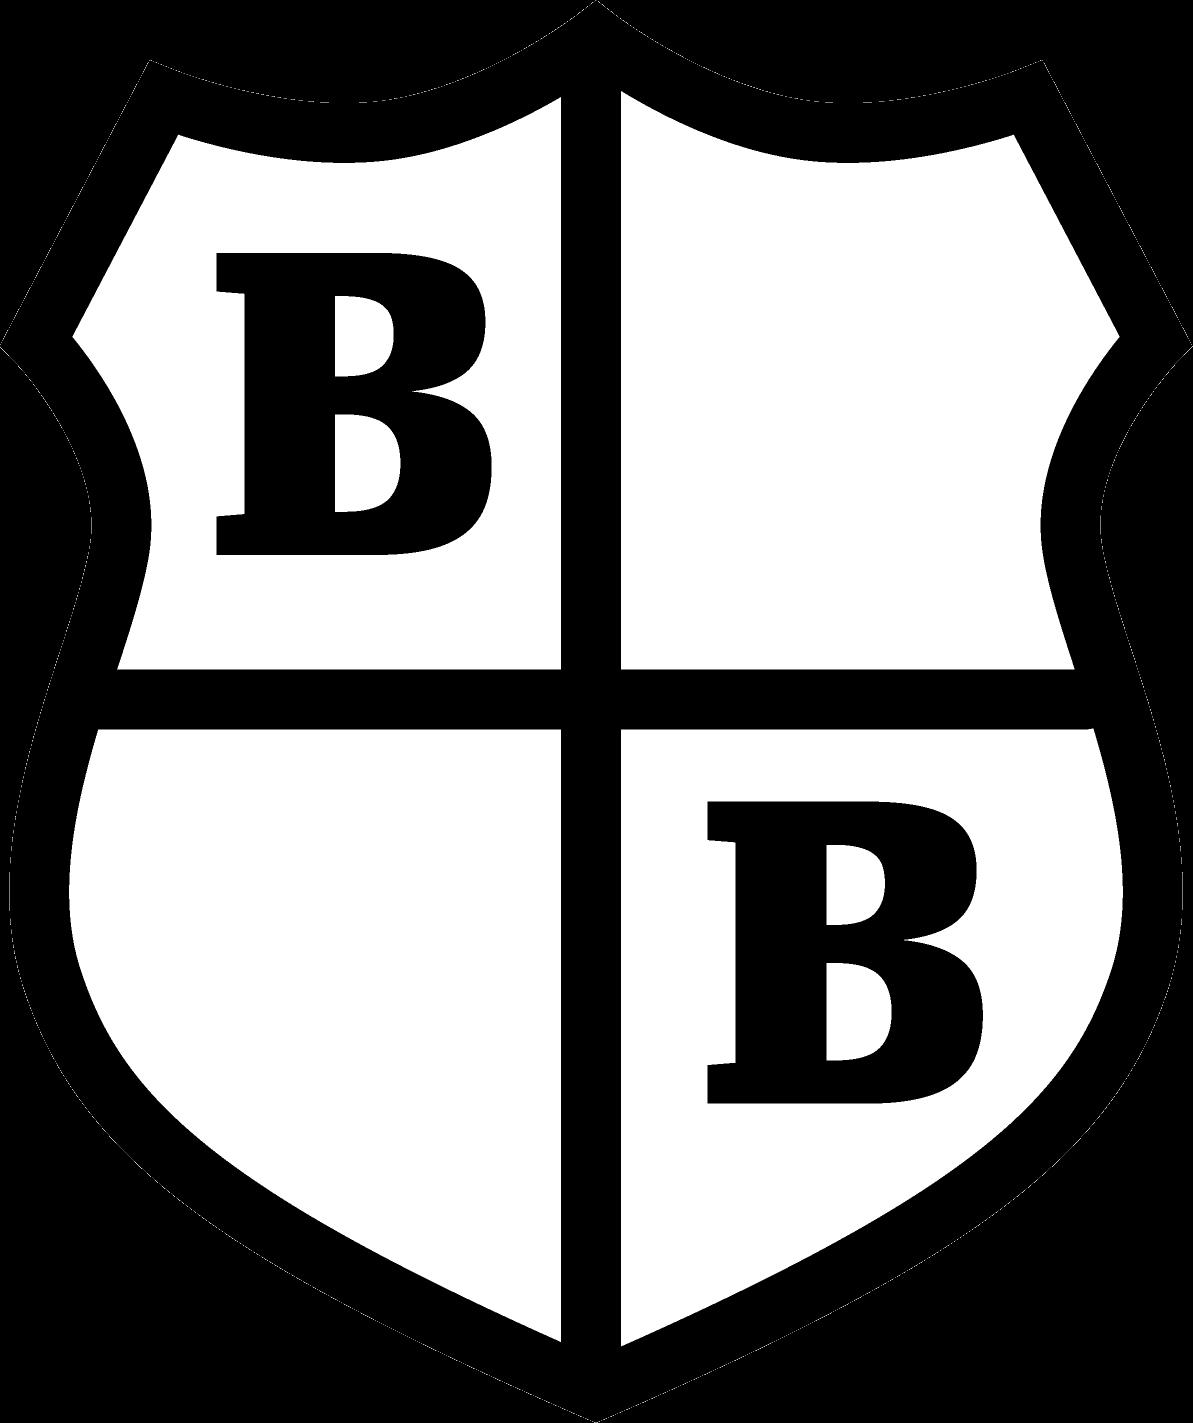 BlacksmithBlades